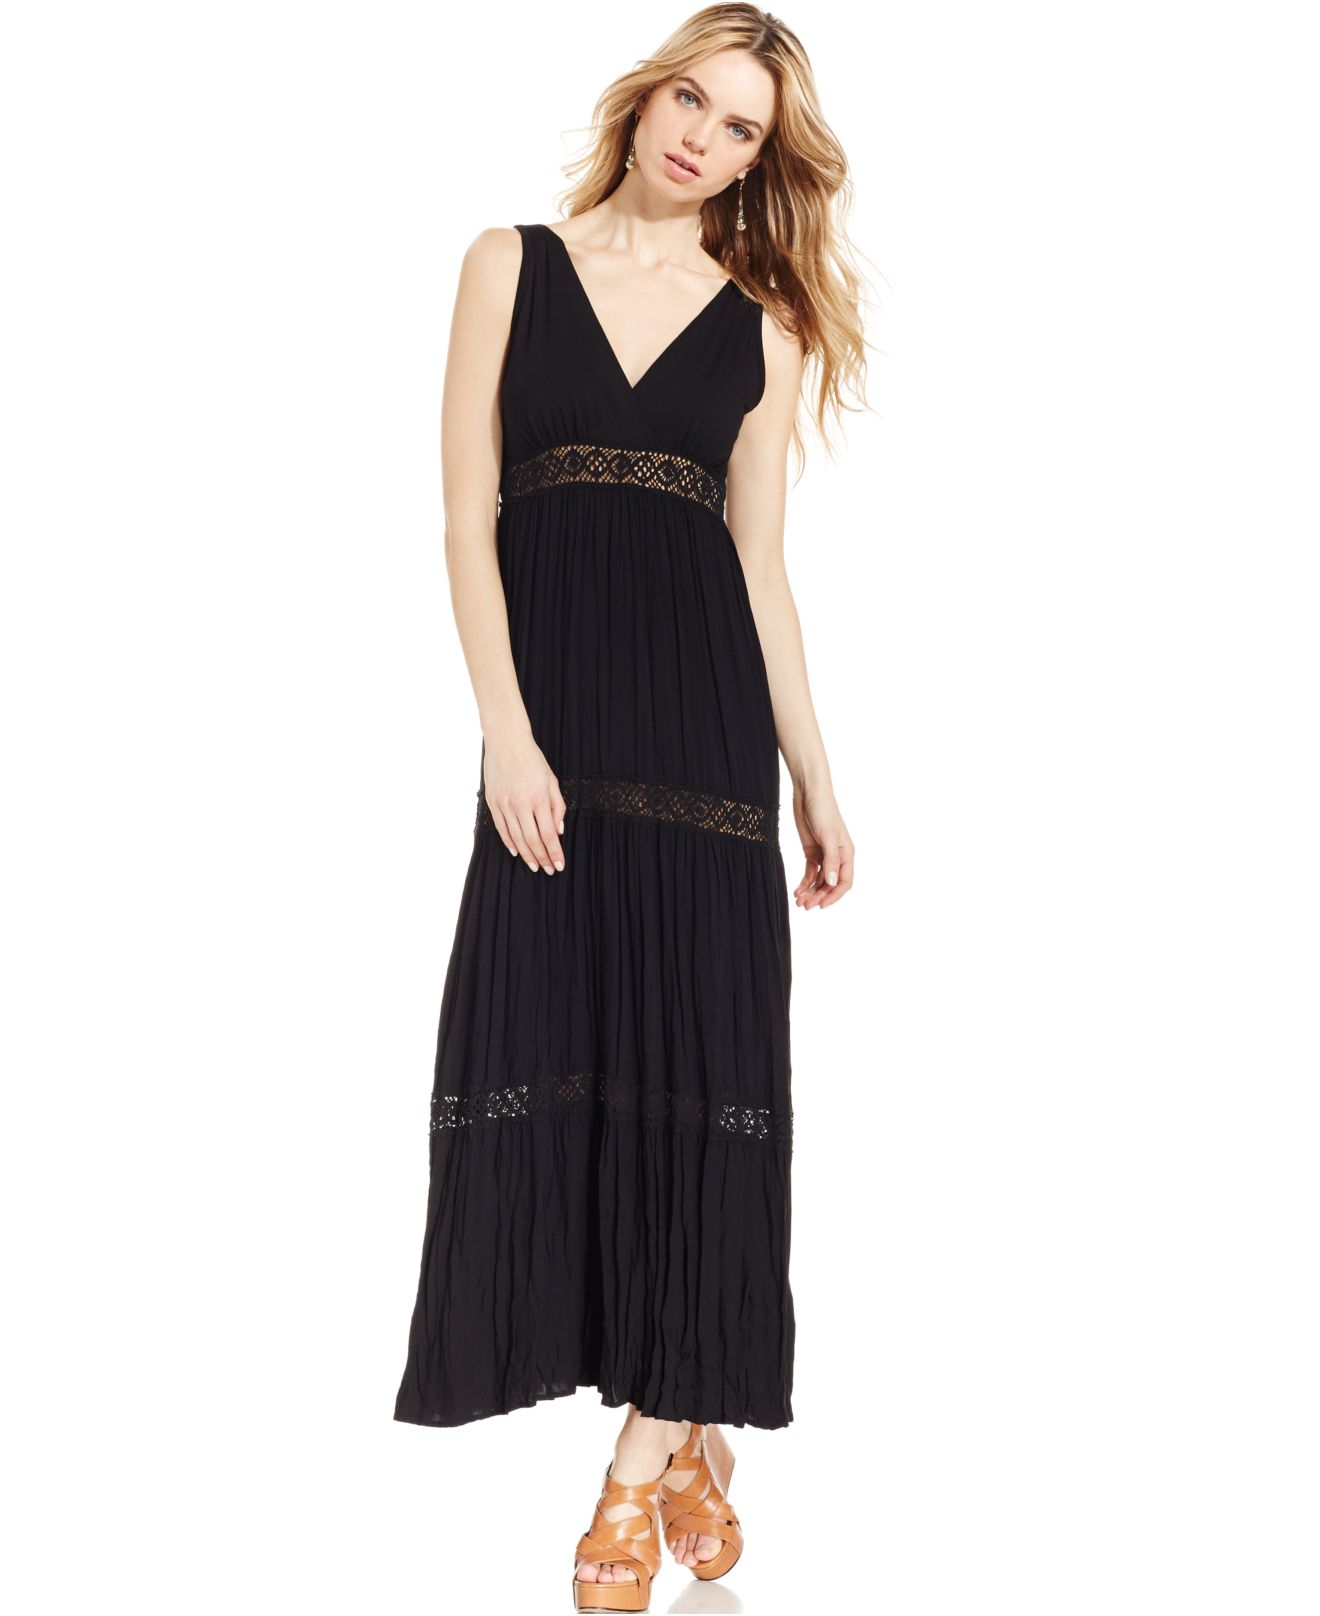 Karen kane Karen By Tiered Maxi Dress in Black | Lyst